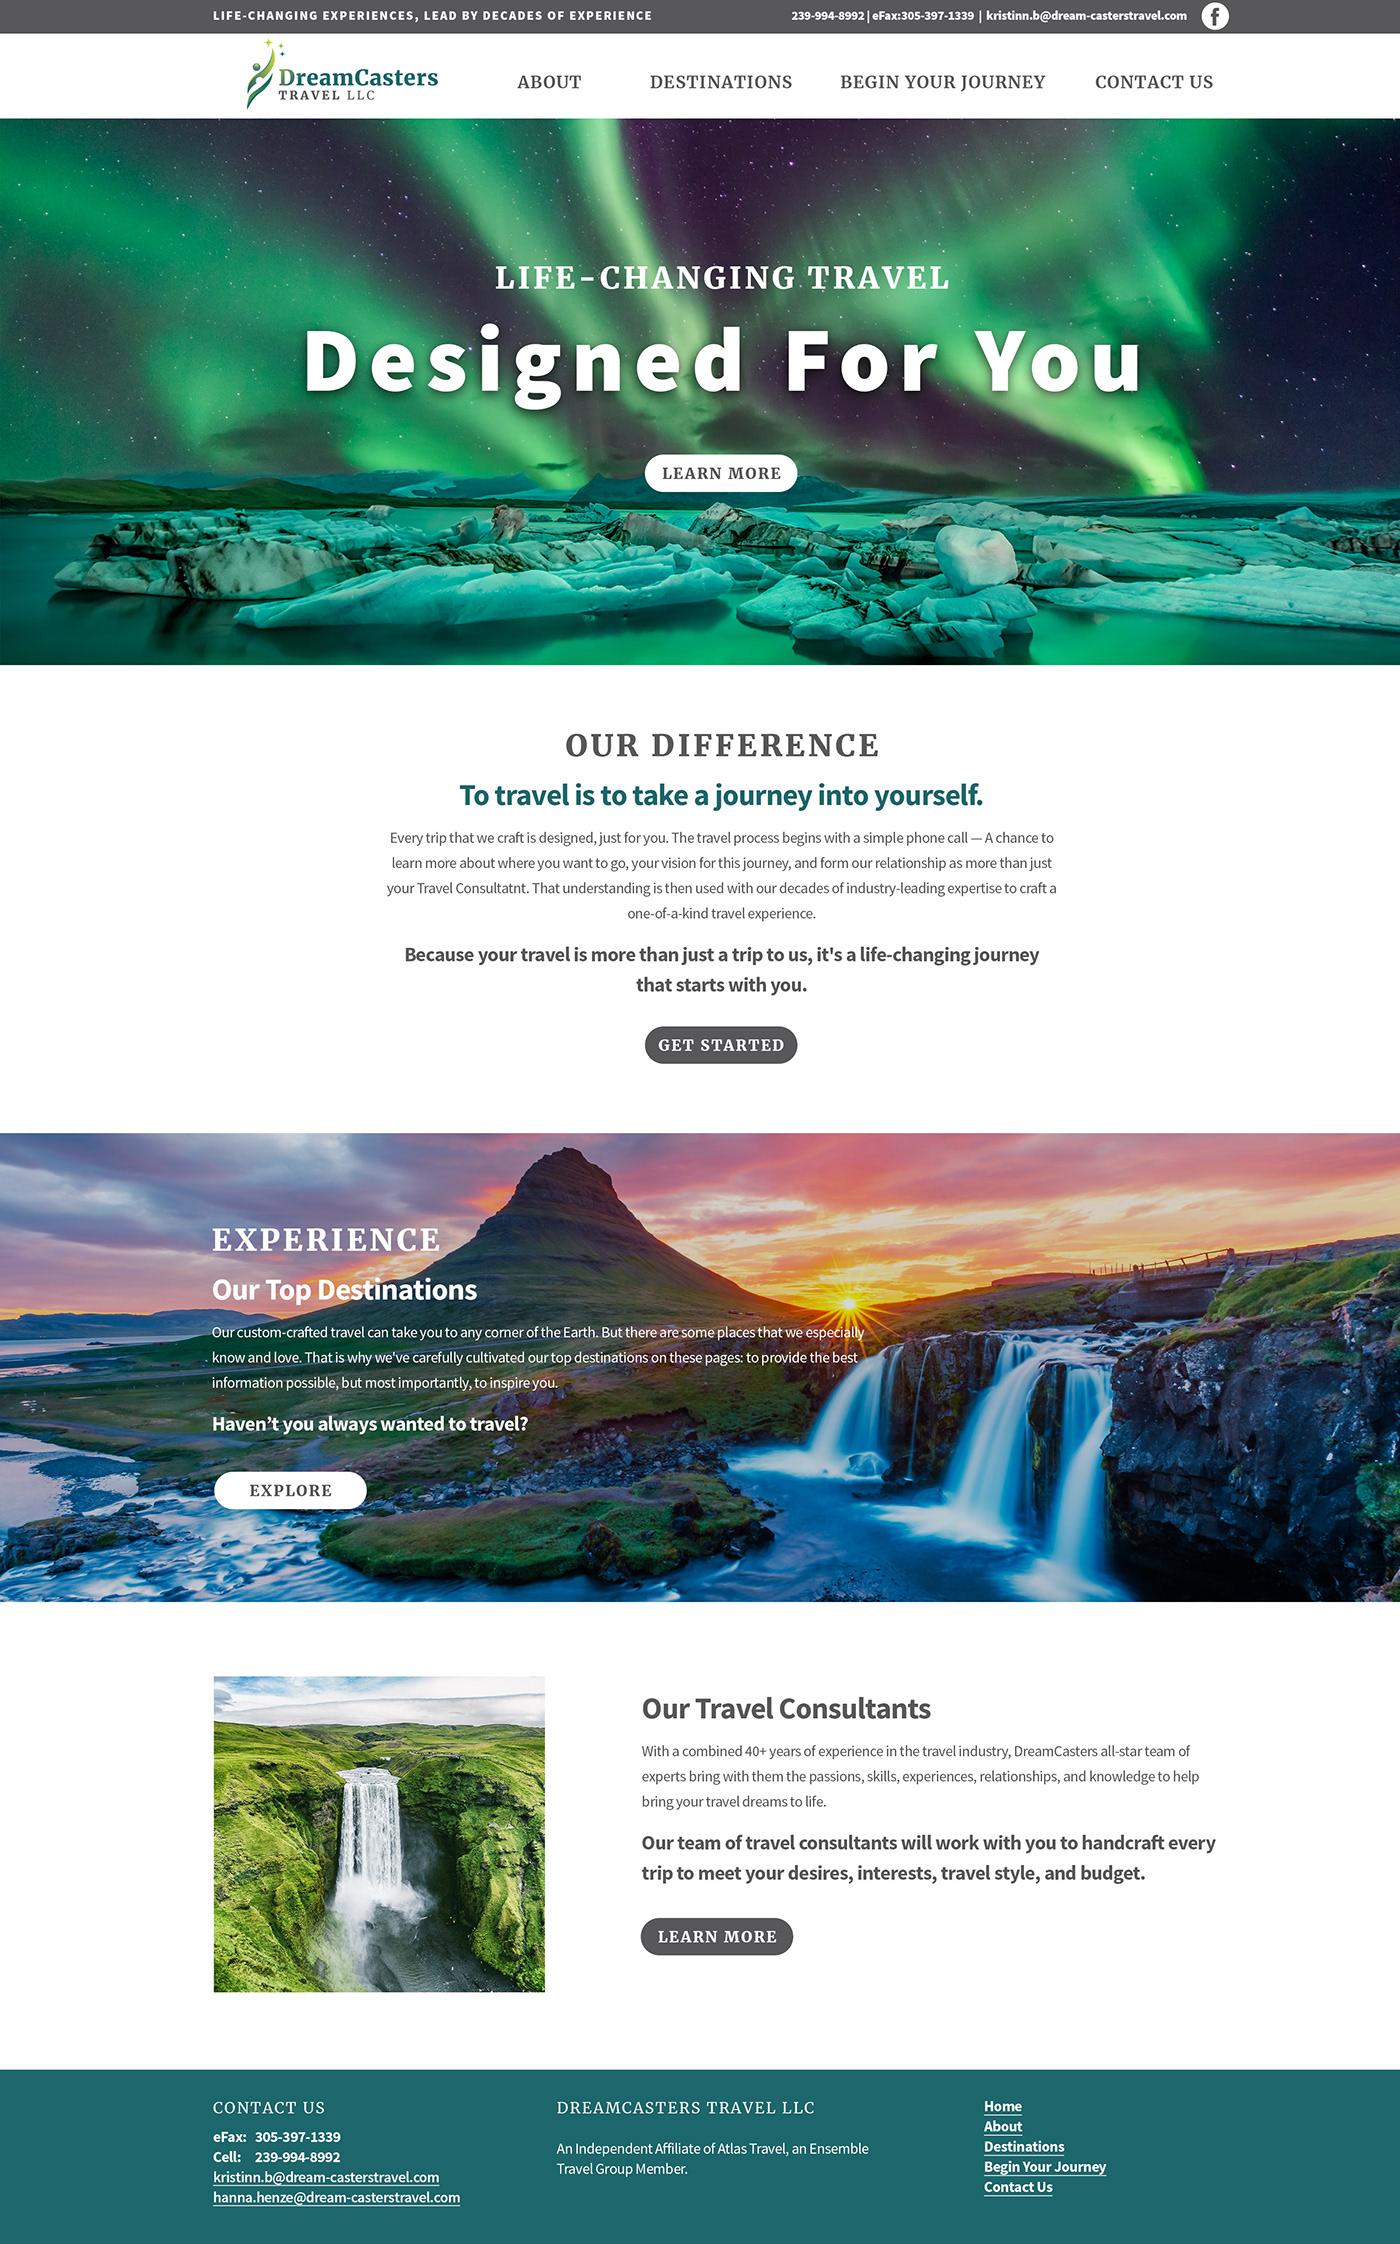 Image may contain: screenshot, water and waterfall